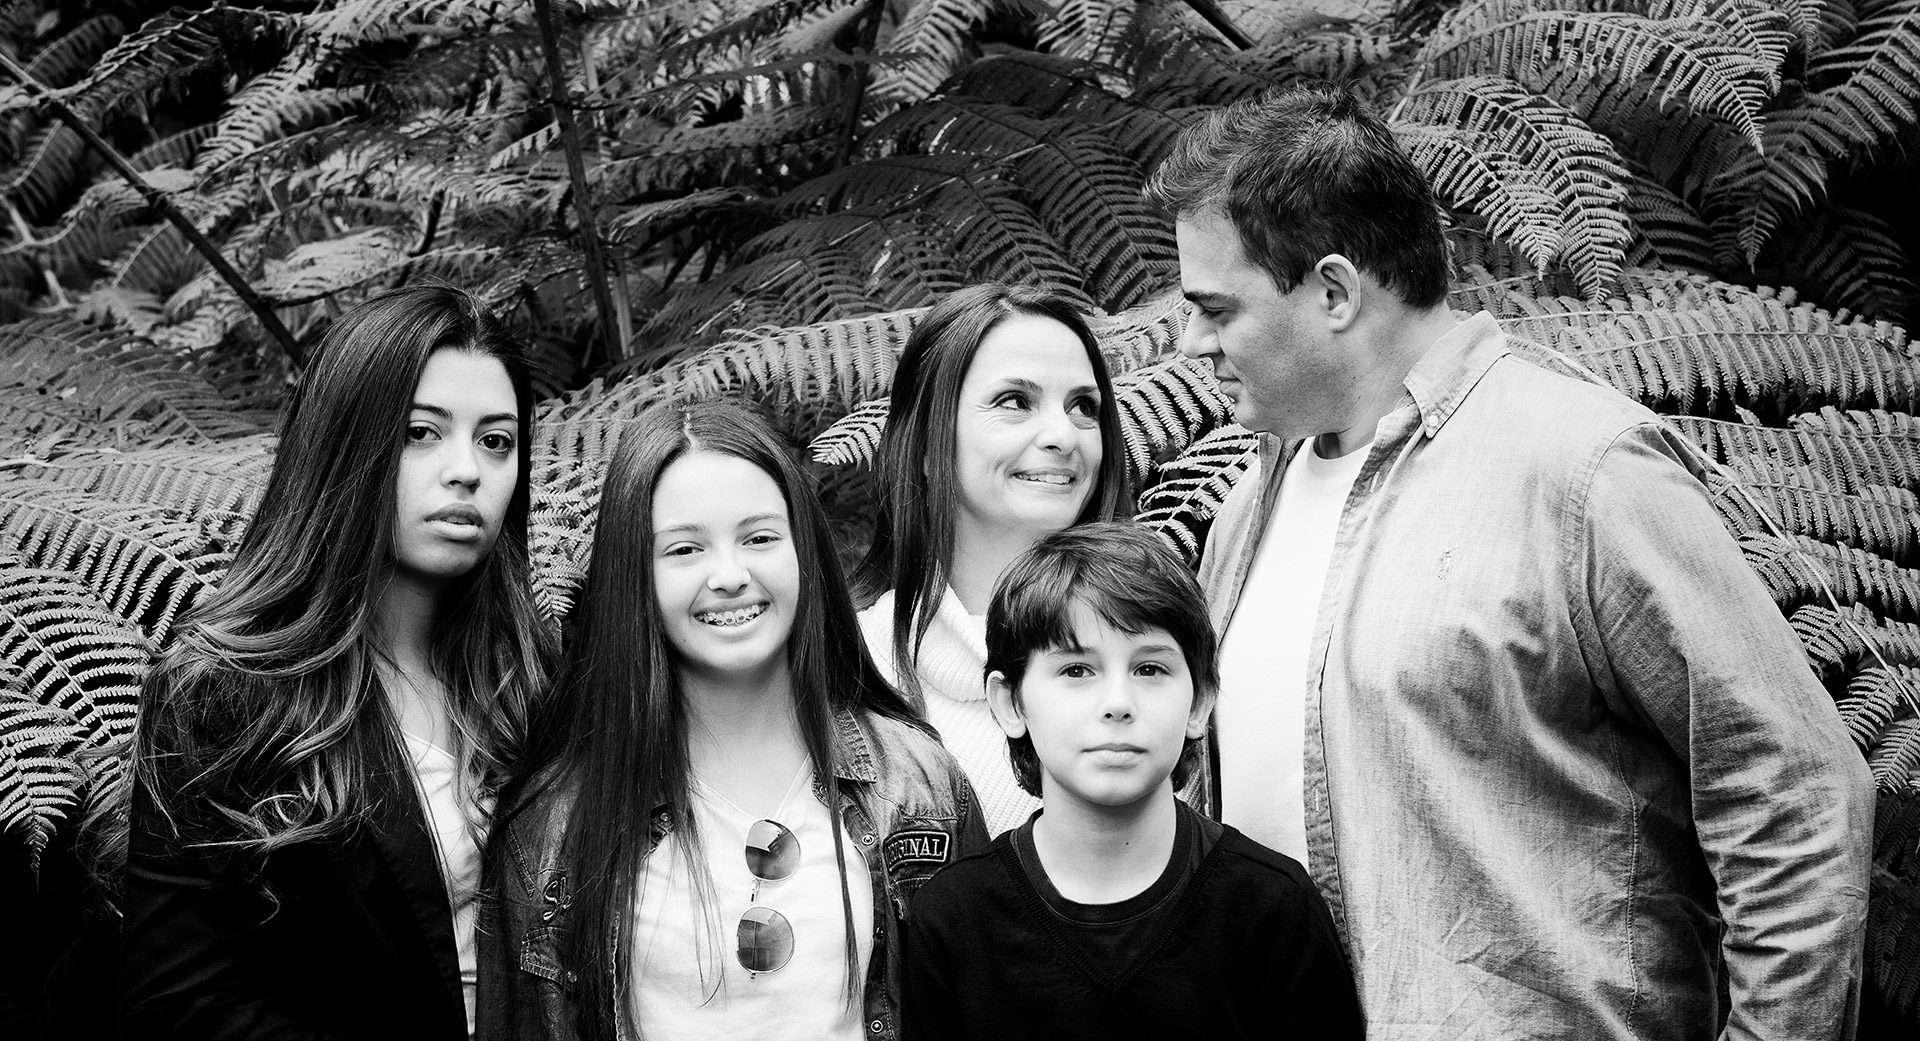 #1 family